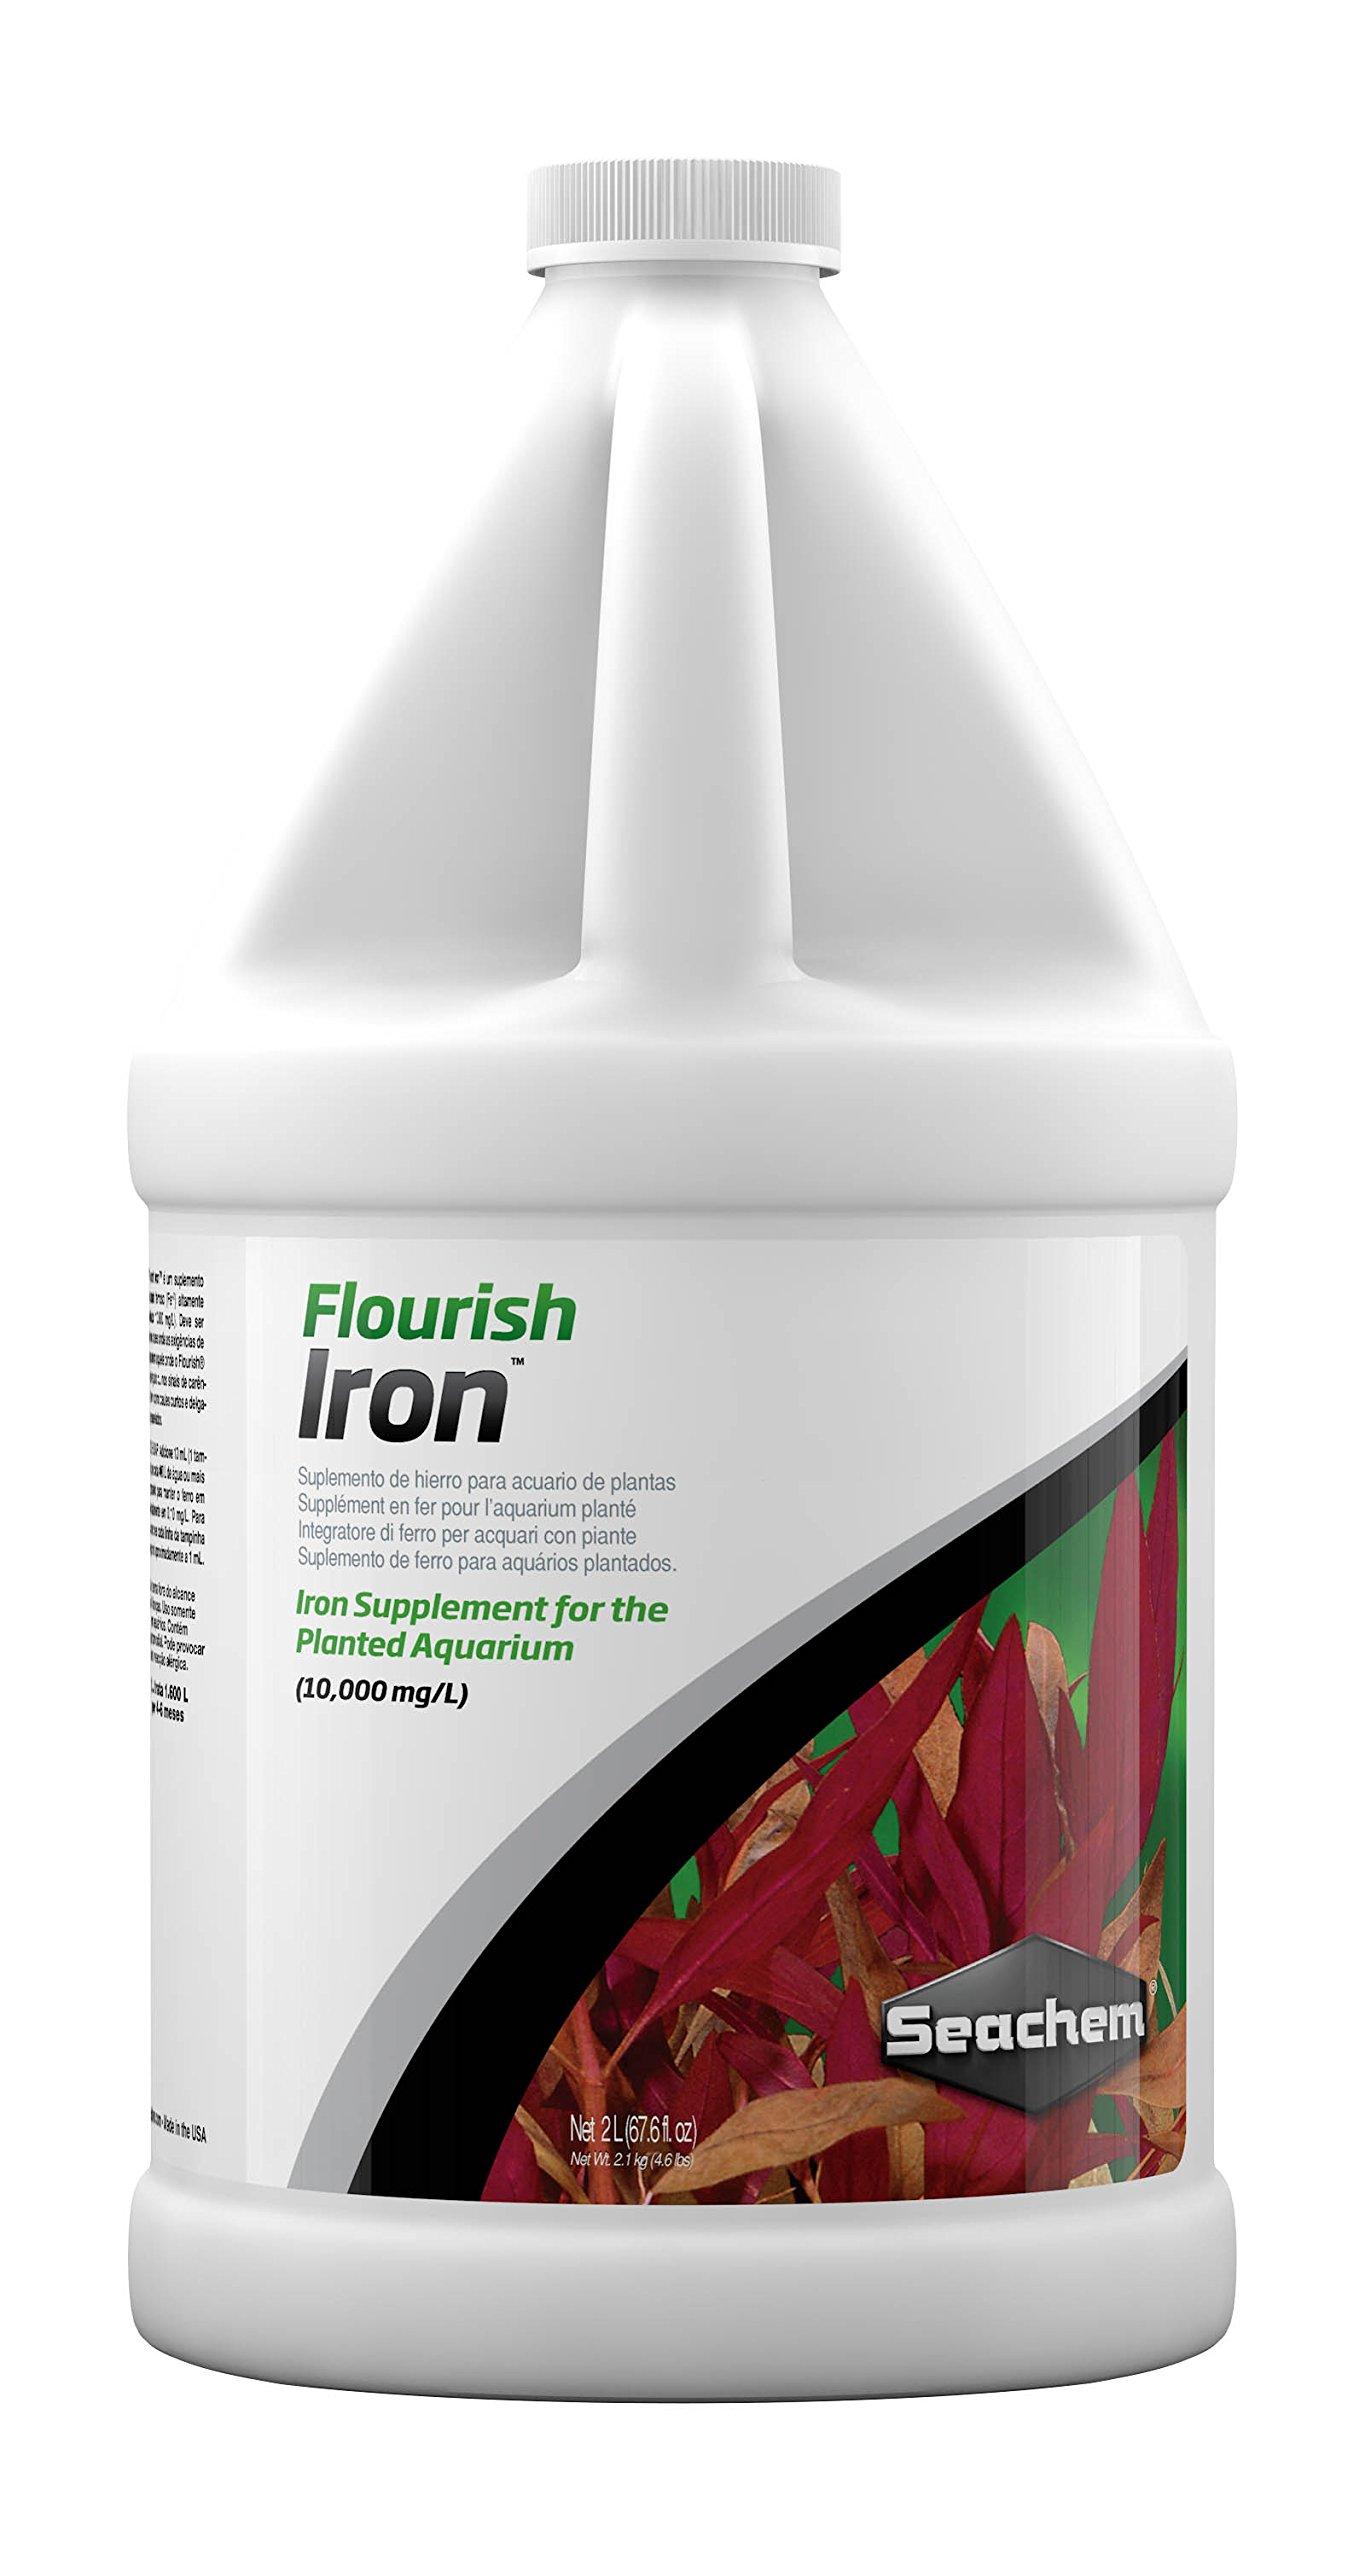 Seachem Flourish Iron, 2 Liter